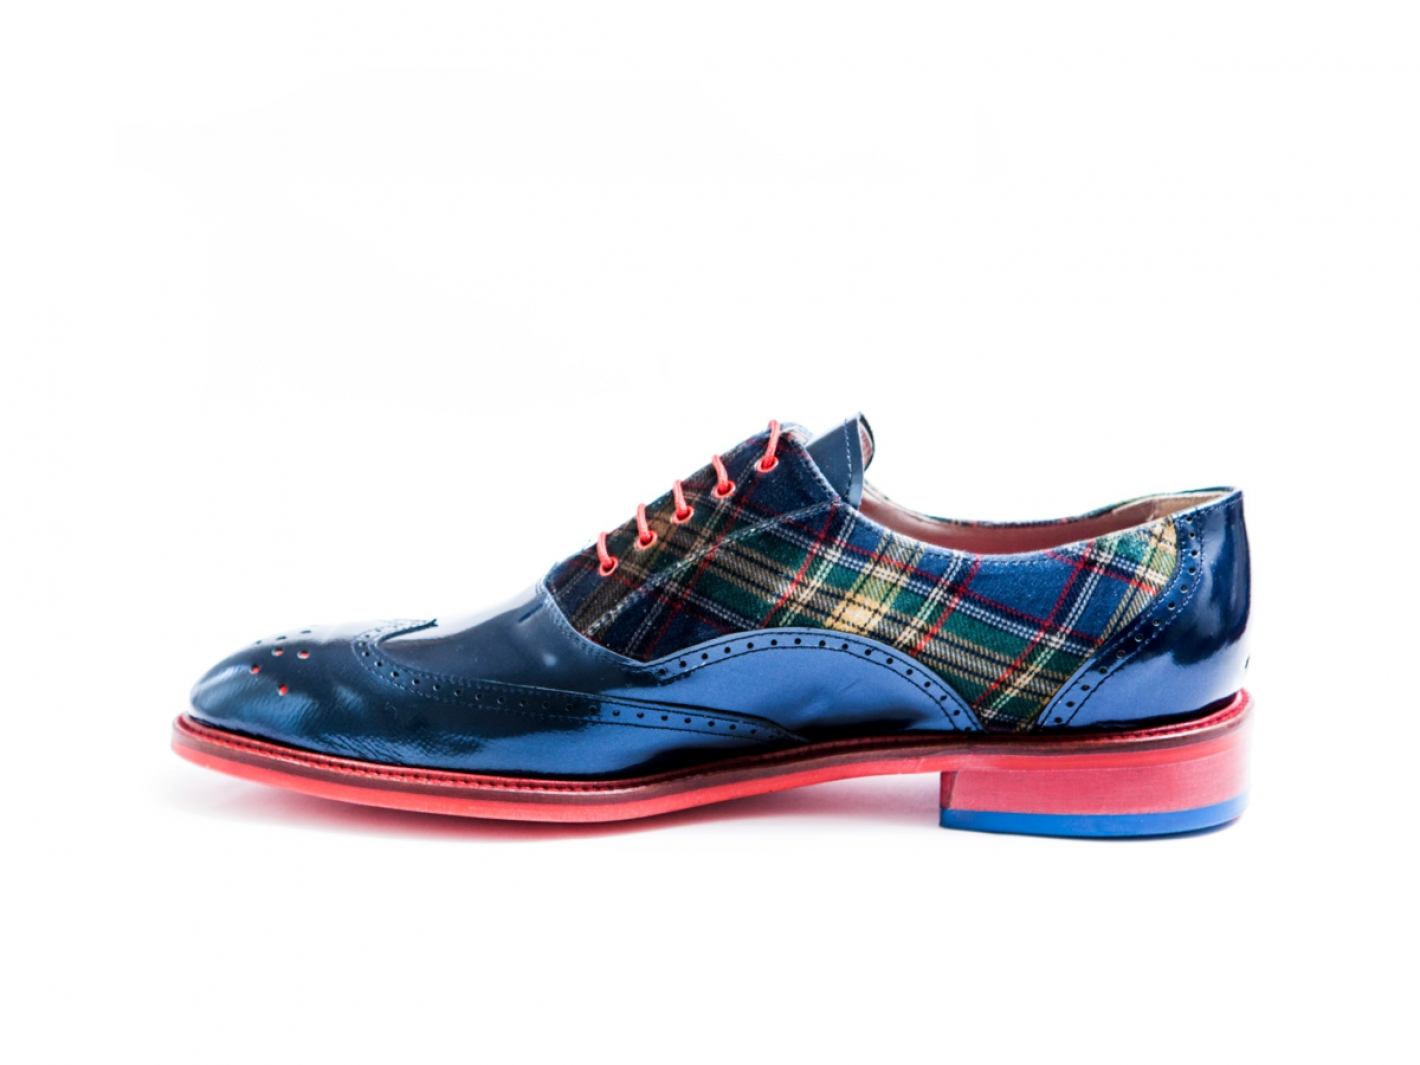 Esco Shoe Size